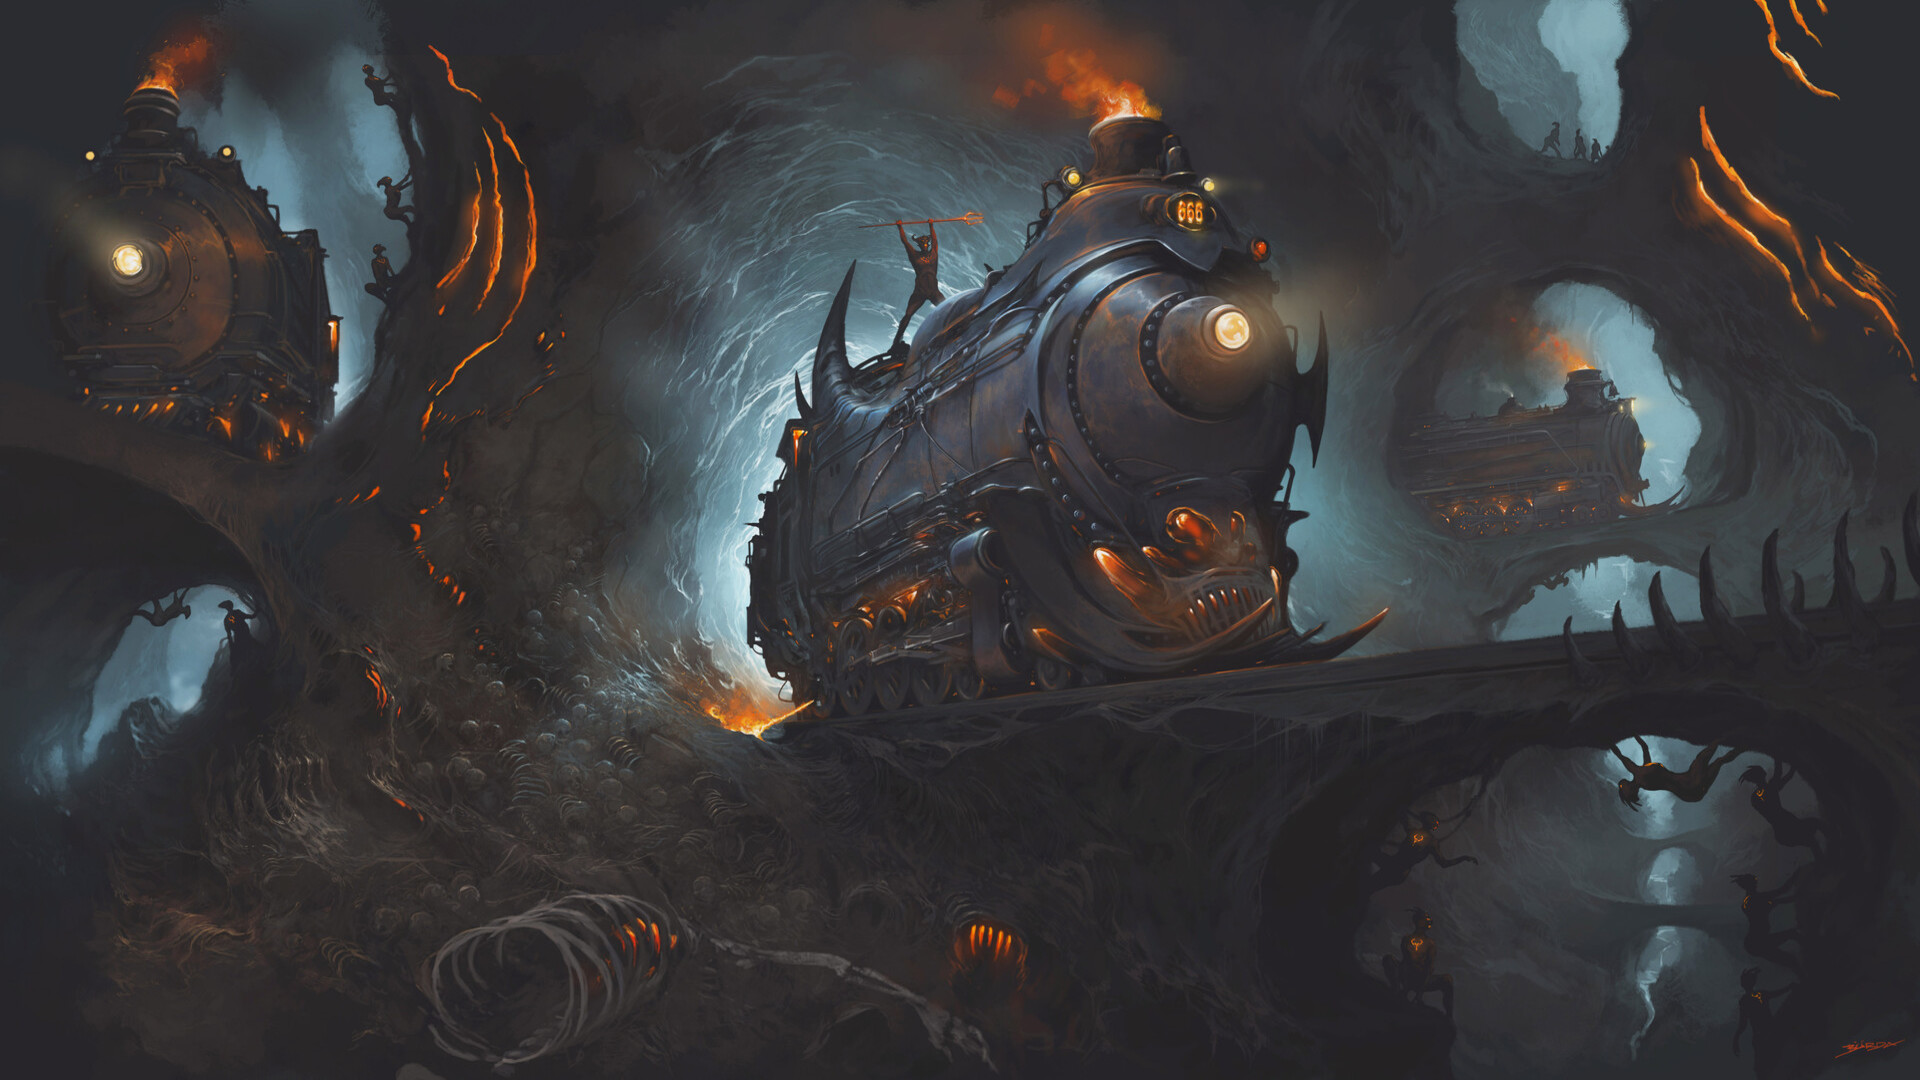 Cave Demon Locomotive Skeleton 1920x1080